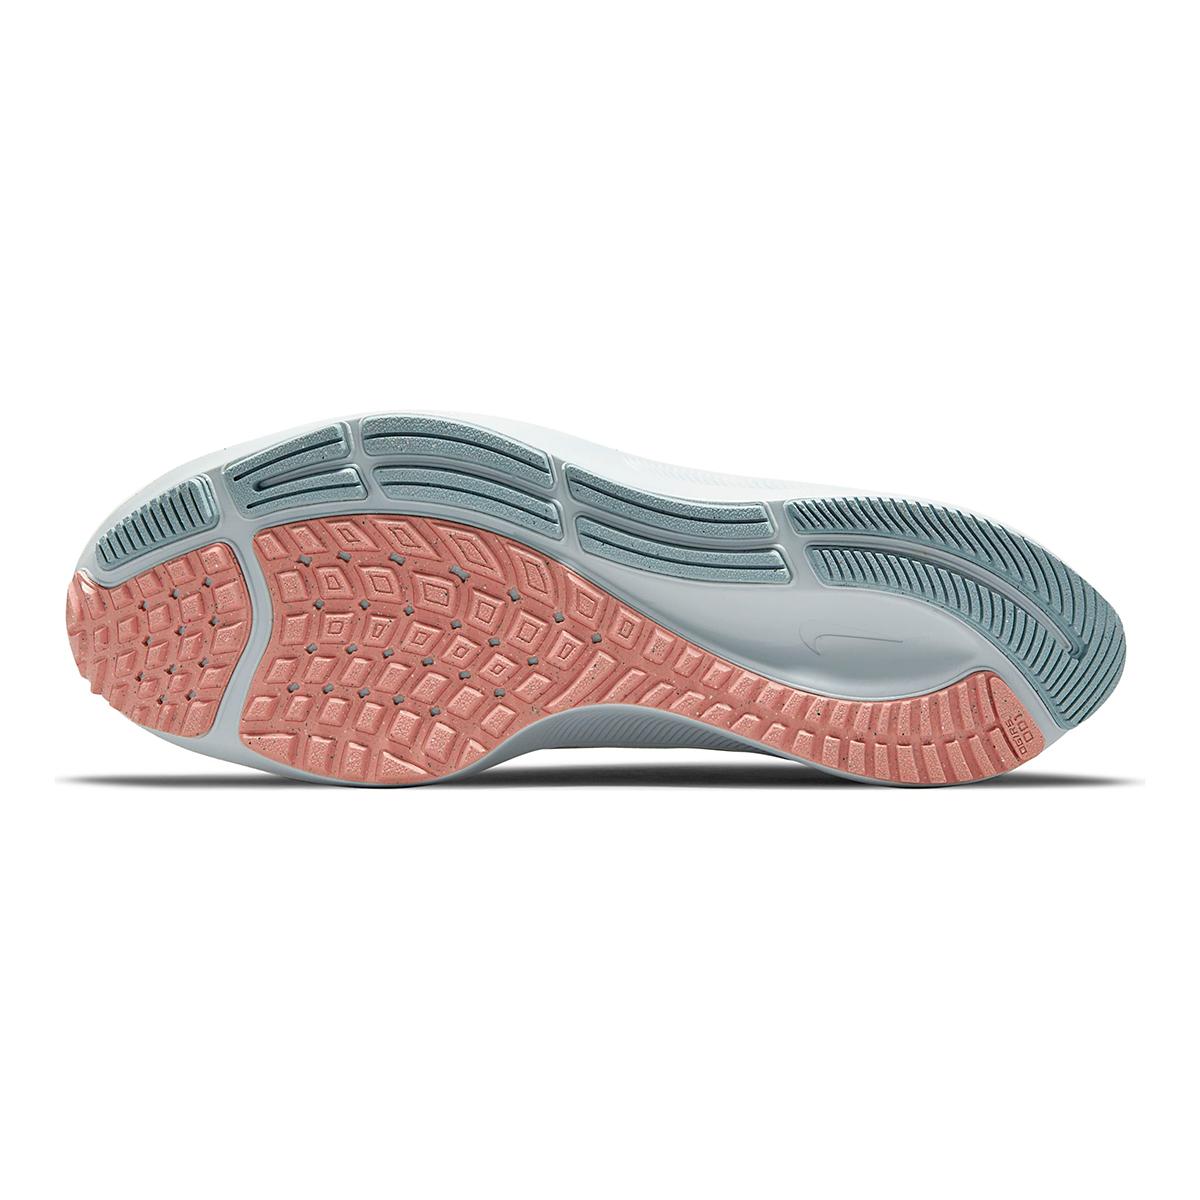 Women's Nike Air Zoom Pegasus 38 Running Shoe - Color: Sail/Ocean Cube/Pink Glaze/Crimson Bliss - Size: 5 - Width: Regular, Sail/Ocean Cube/Pink Glaze/Crimson Bliss, large, image 7